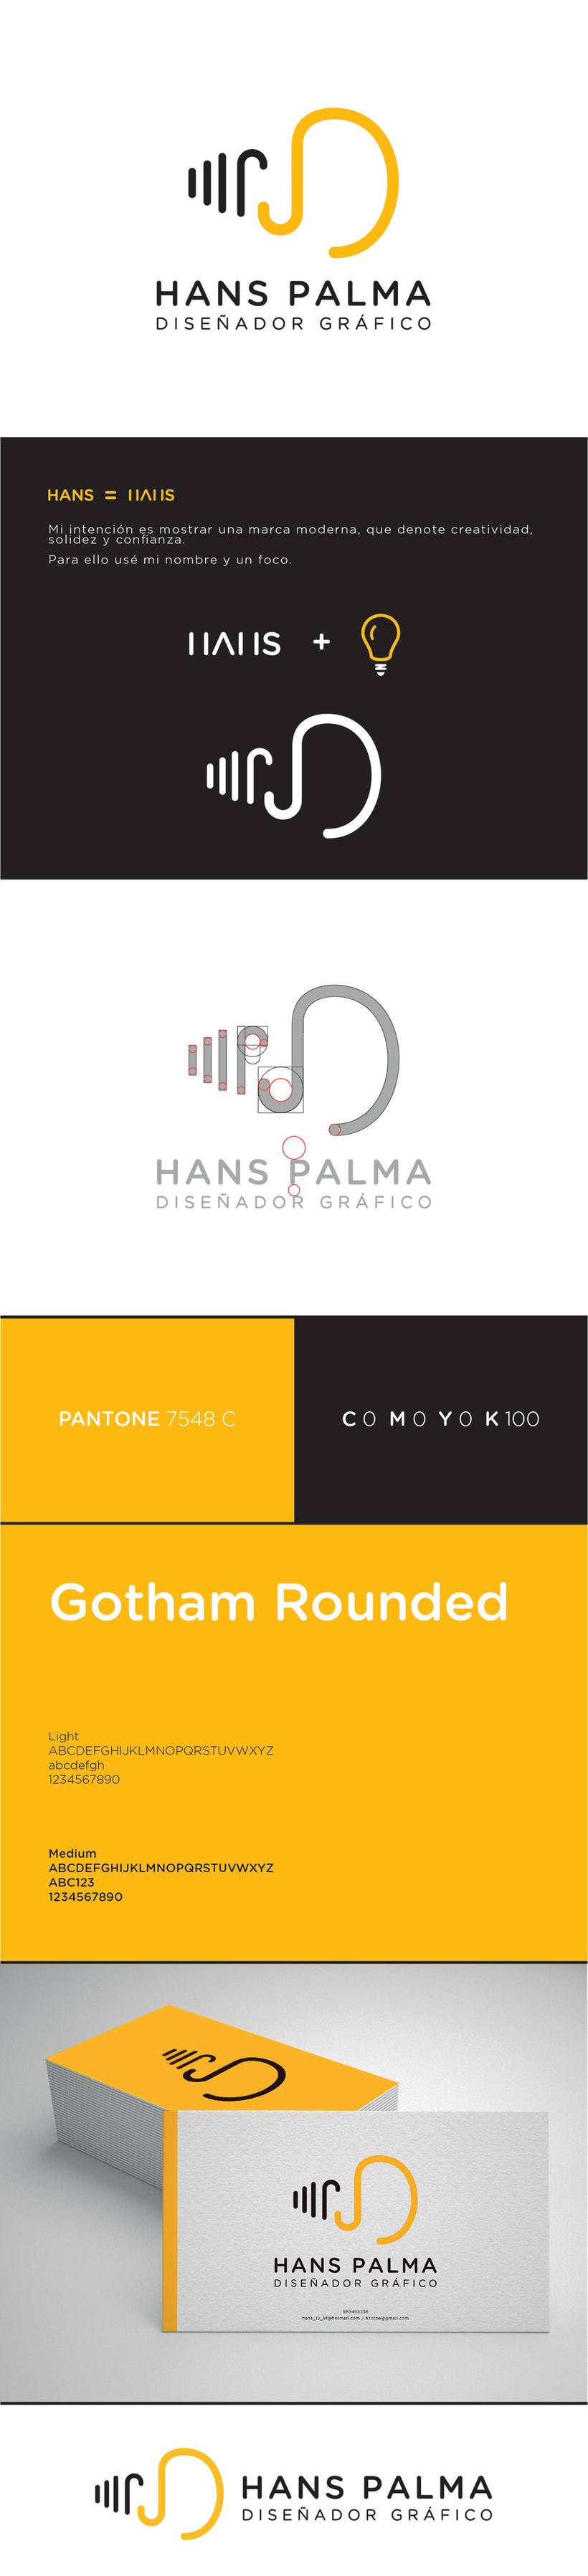 Personal Branding 0